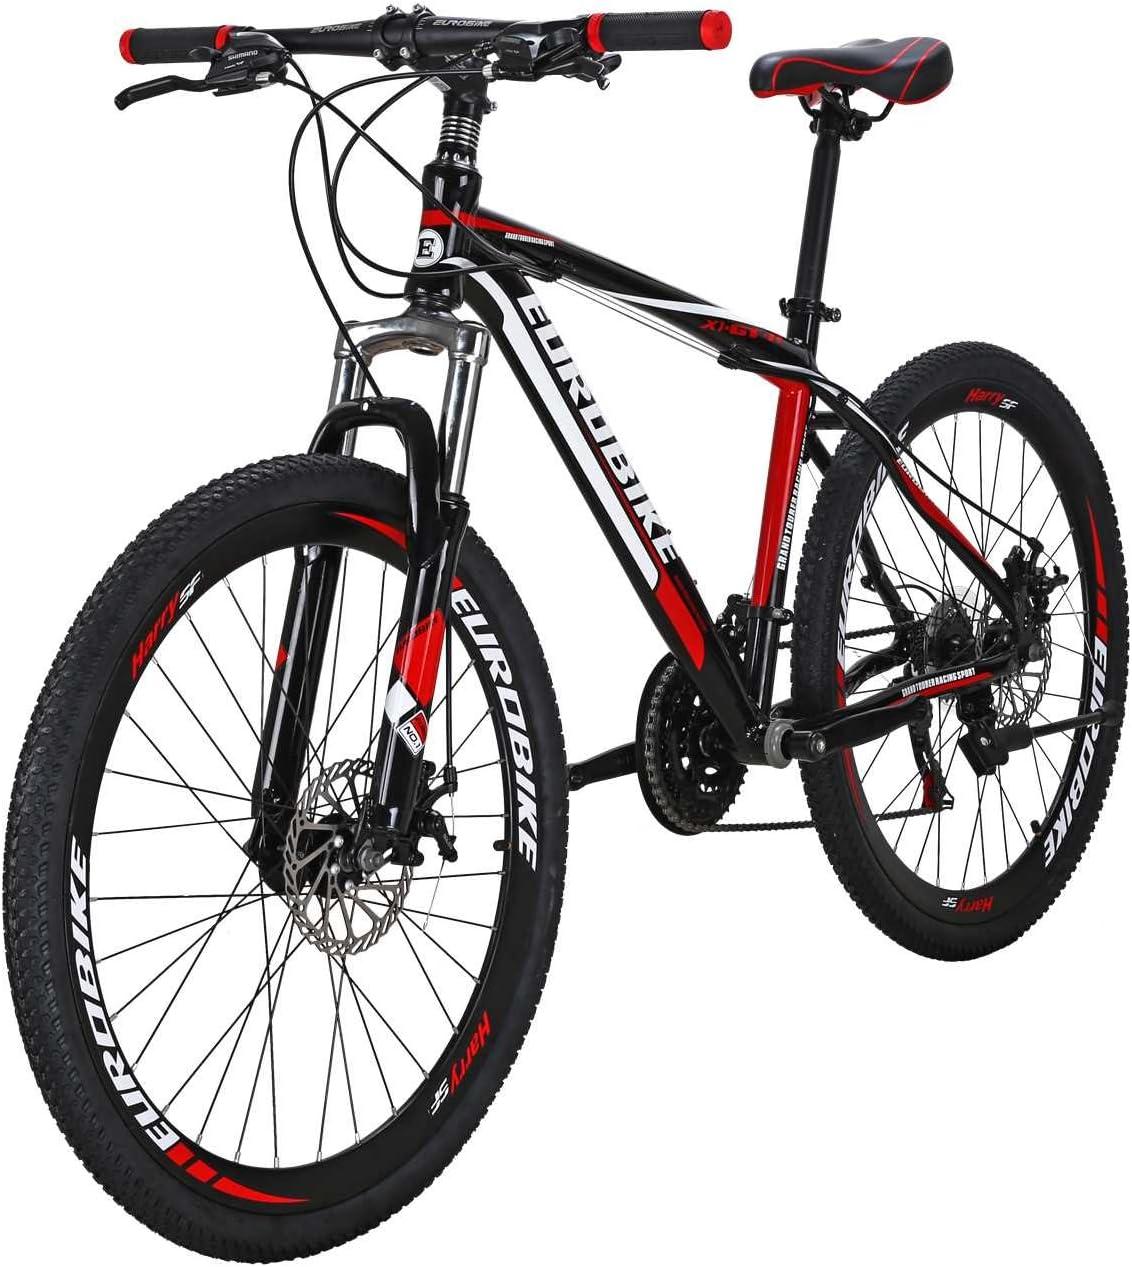 TSMBIKE X1 GTRアルミニウム合金フレーム マウンテンバイク 26寸21速 シマノ変速前後ディスクブレーキ ハードテイル 自転車 軽量 ポータブル 通勤通学自転車 ブラック&レッド